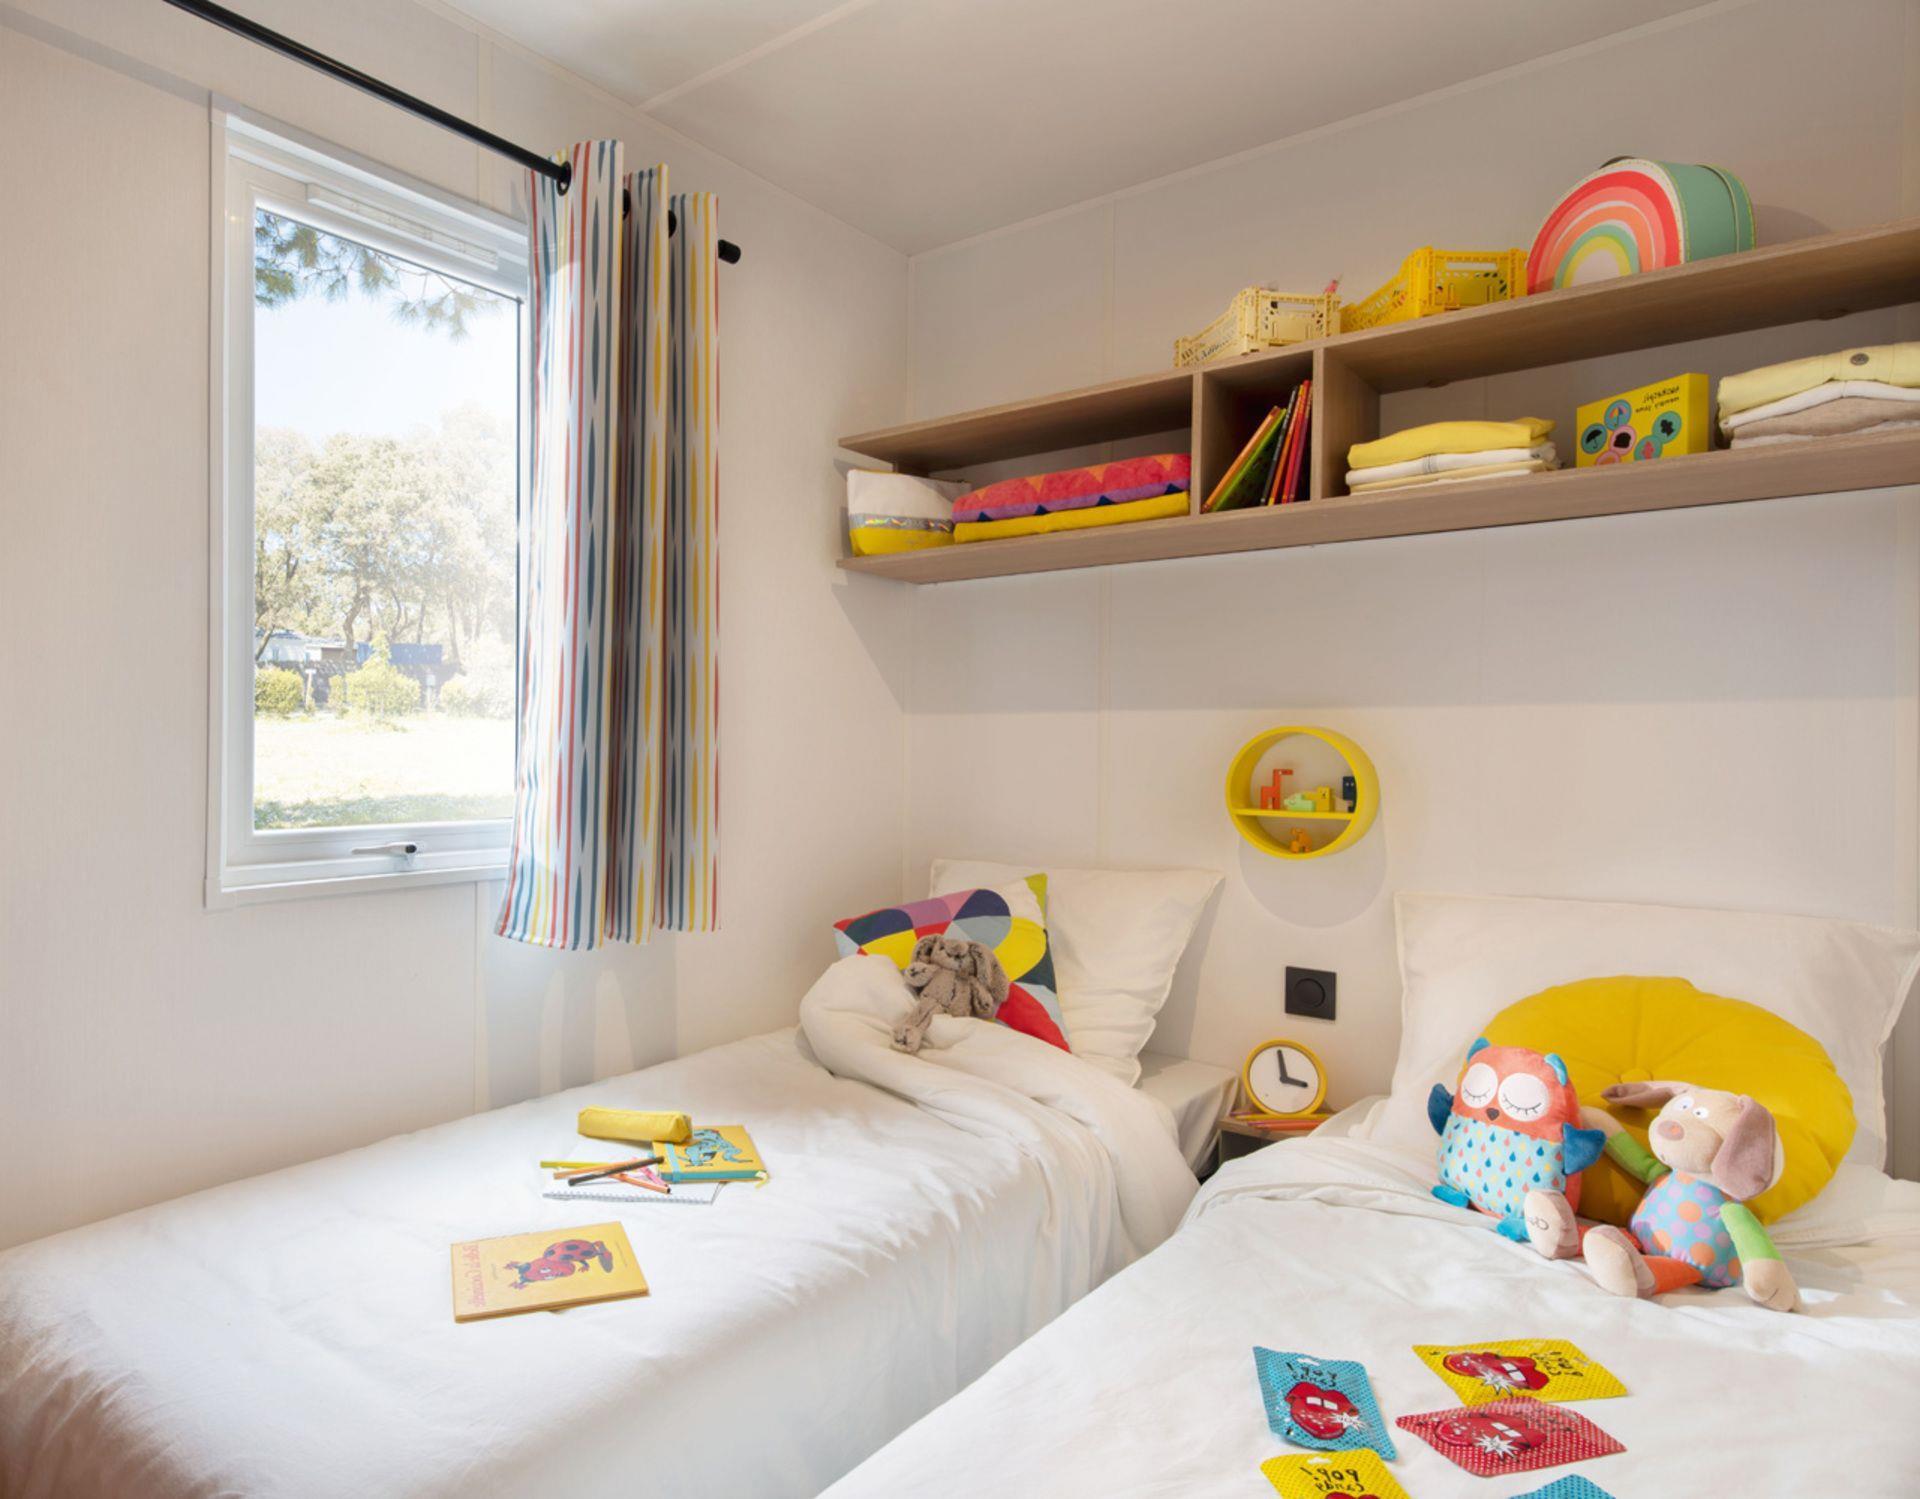 Mobil-home IRM Loggia 25m² - 2 chambres